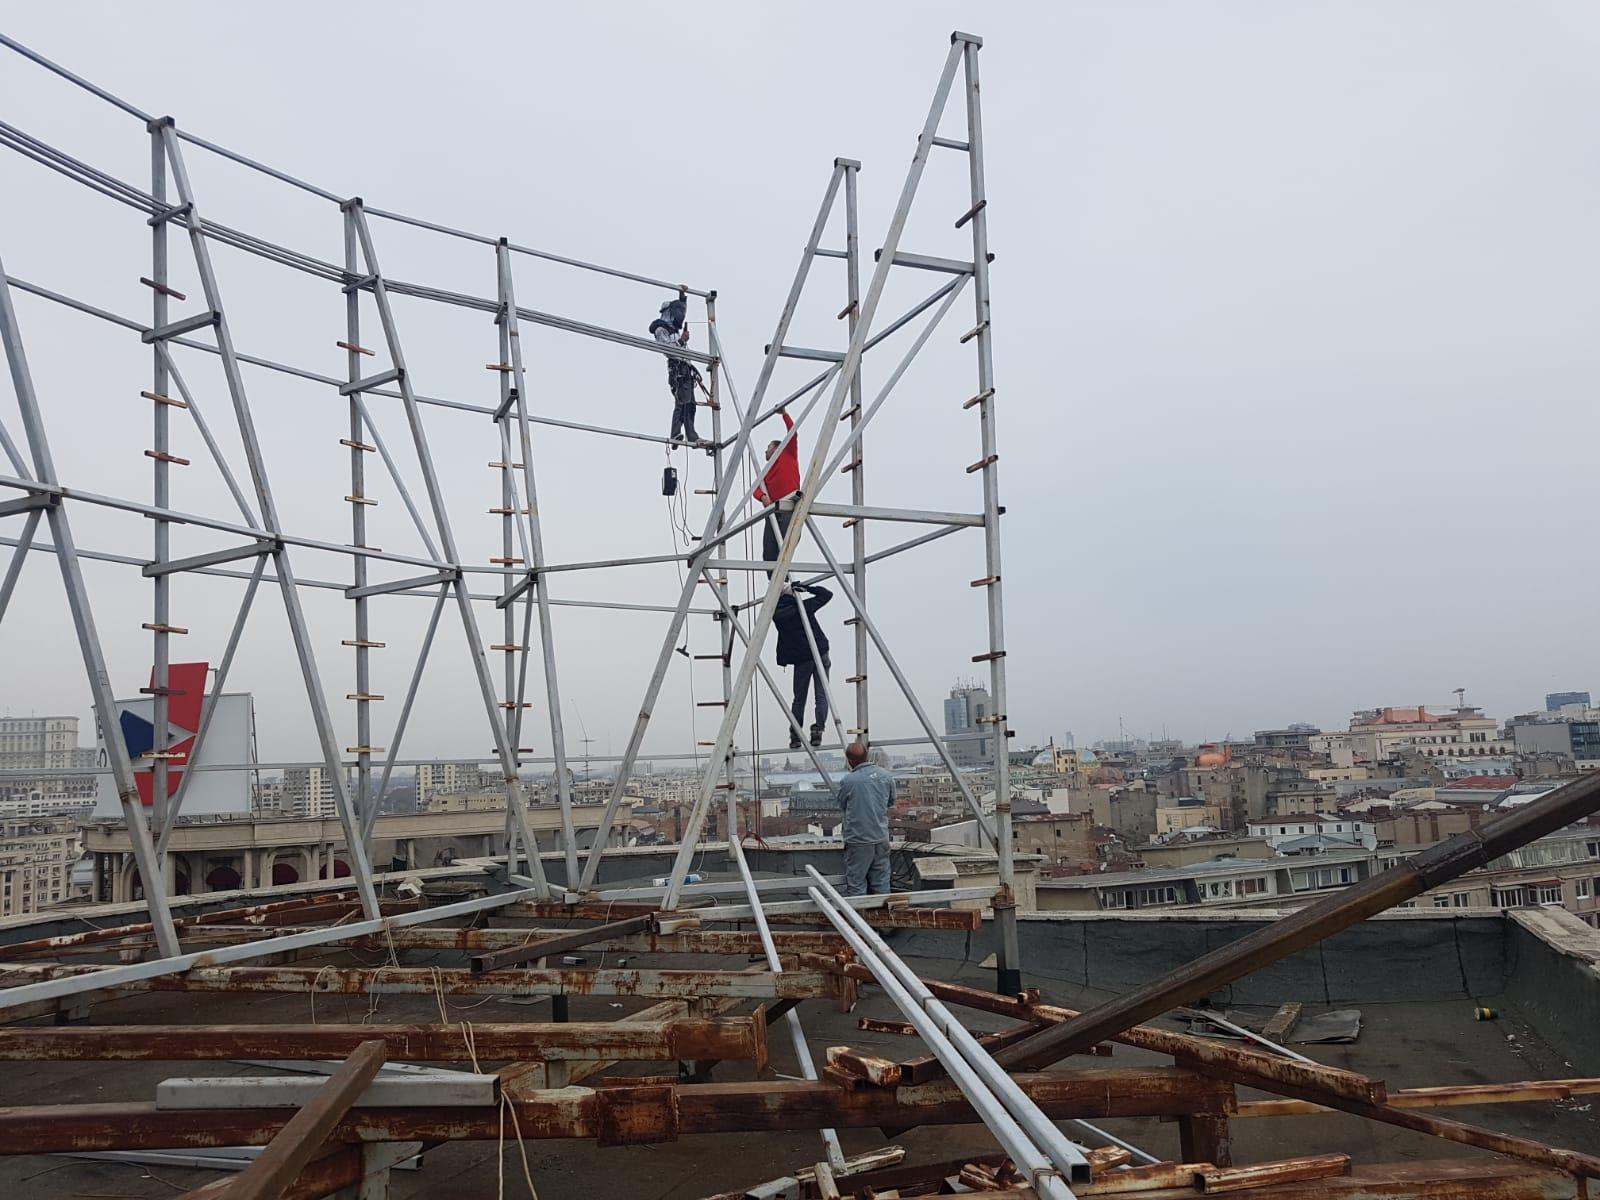 servicii alpinism utilitar betaalpin